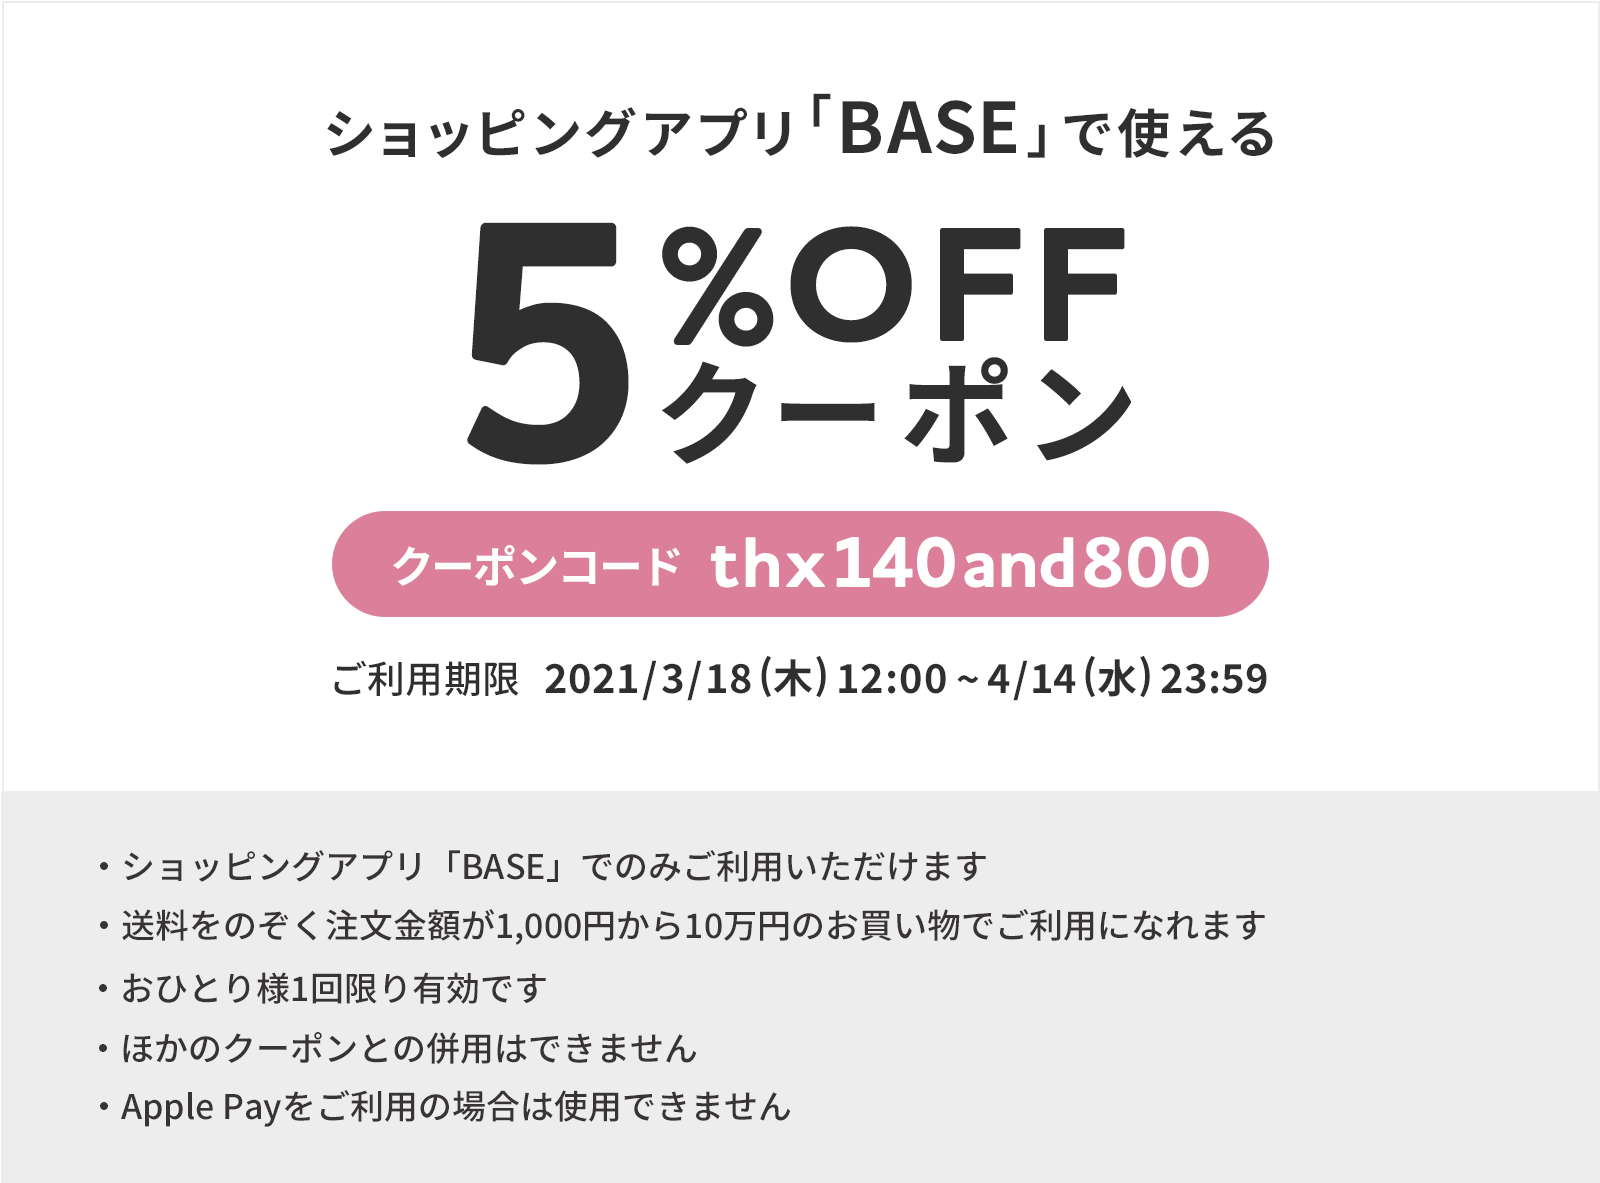 【BASE】期間限定5%OFFクーポン配布中!